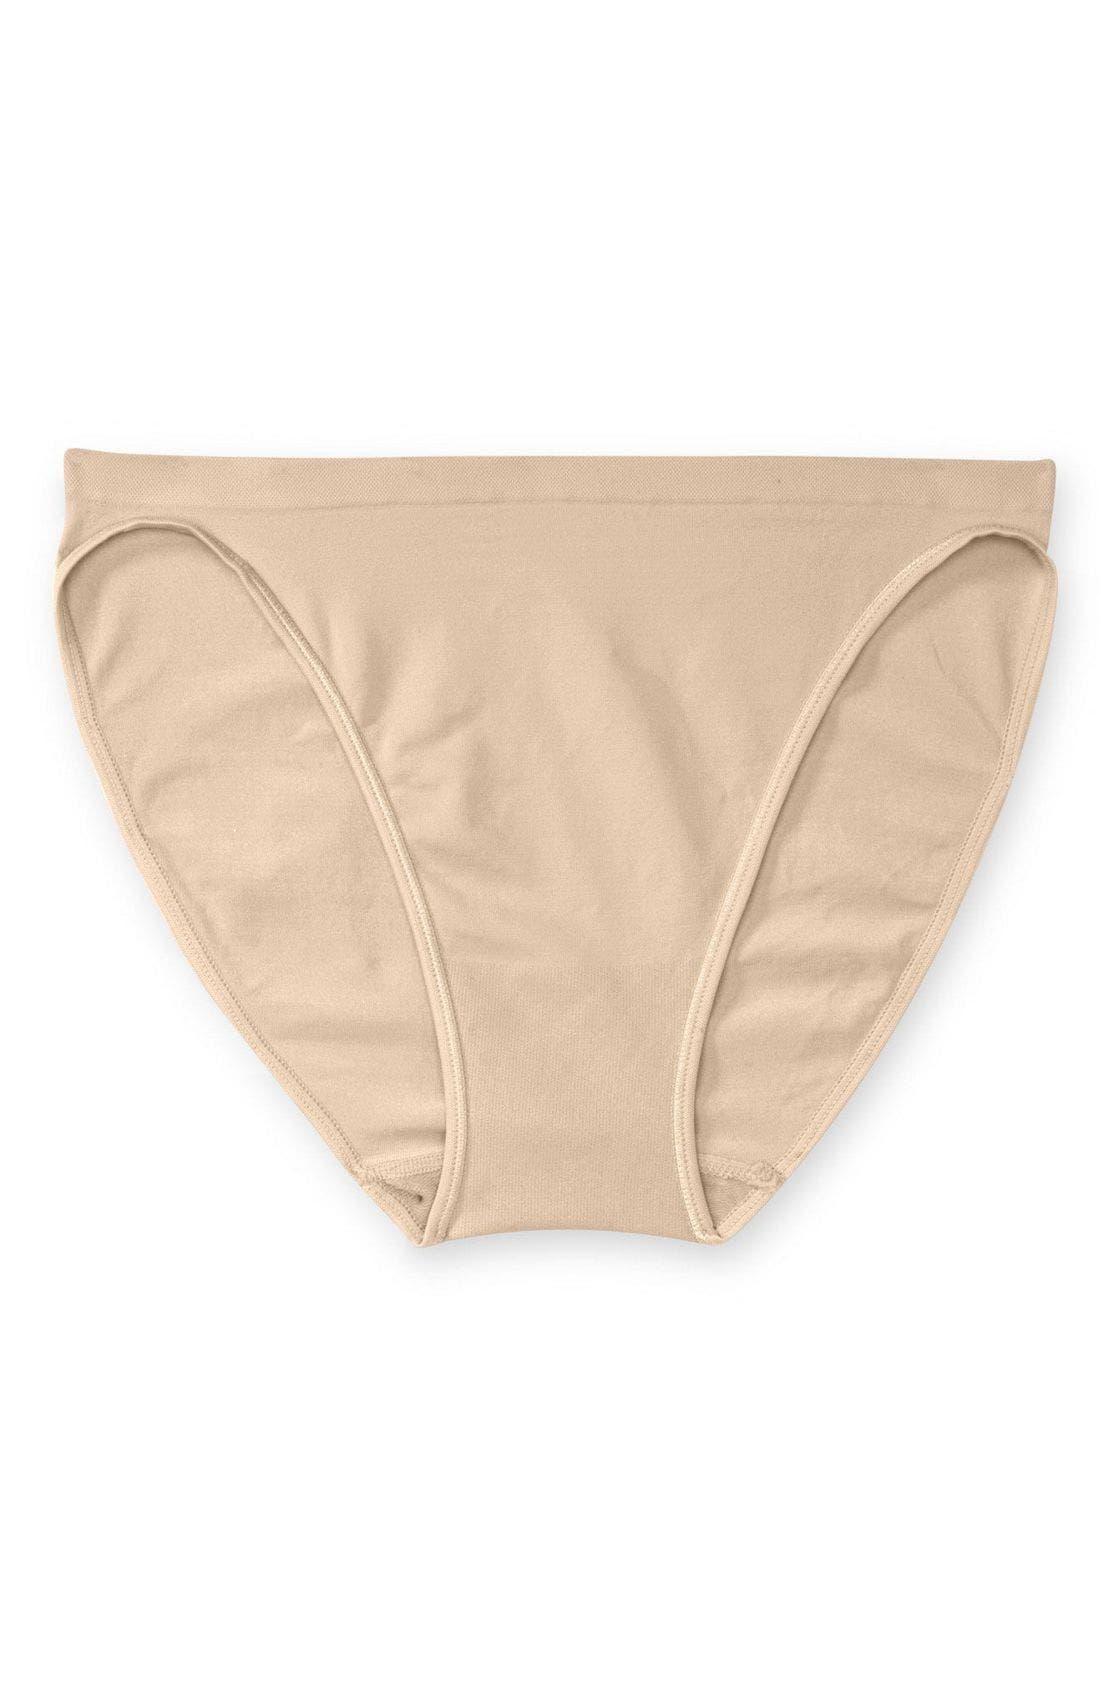 Alternate Image 3  - Shimera Seamless Bikini Panties (Online Only)